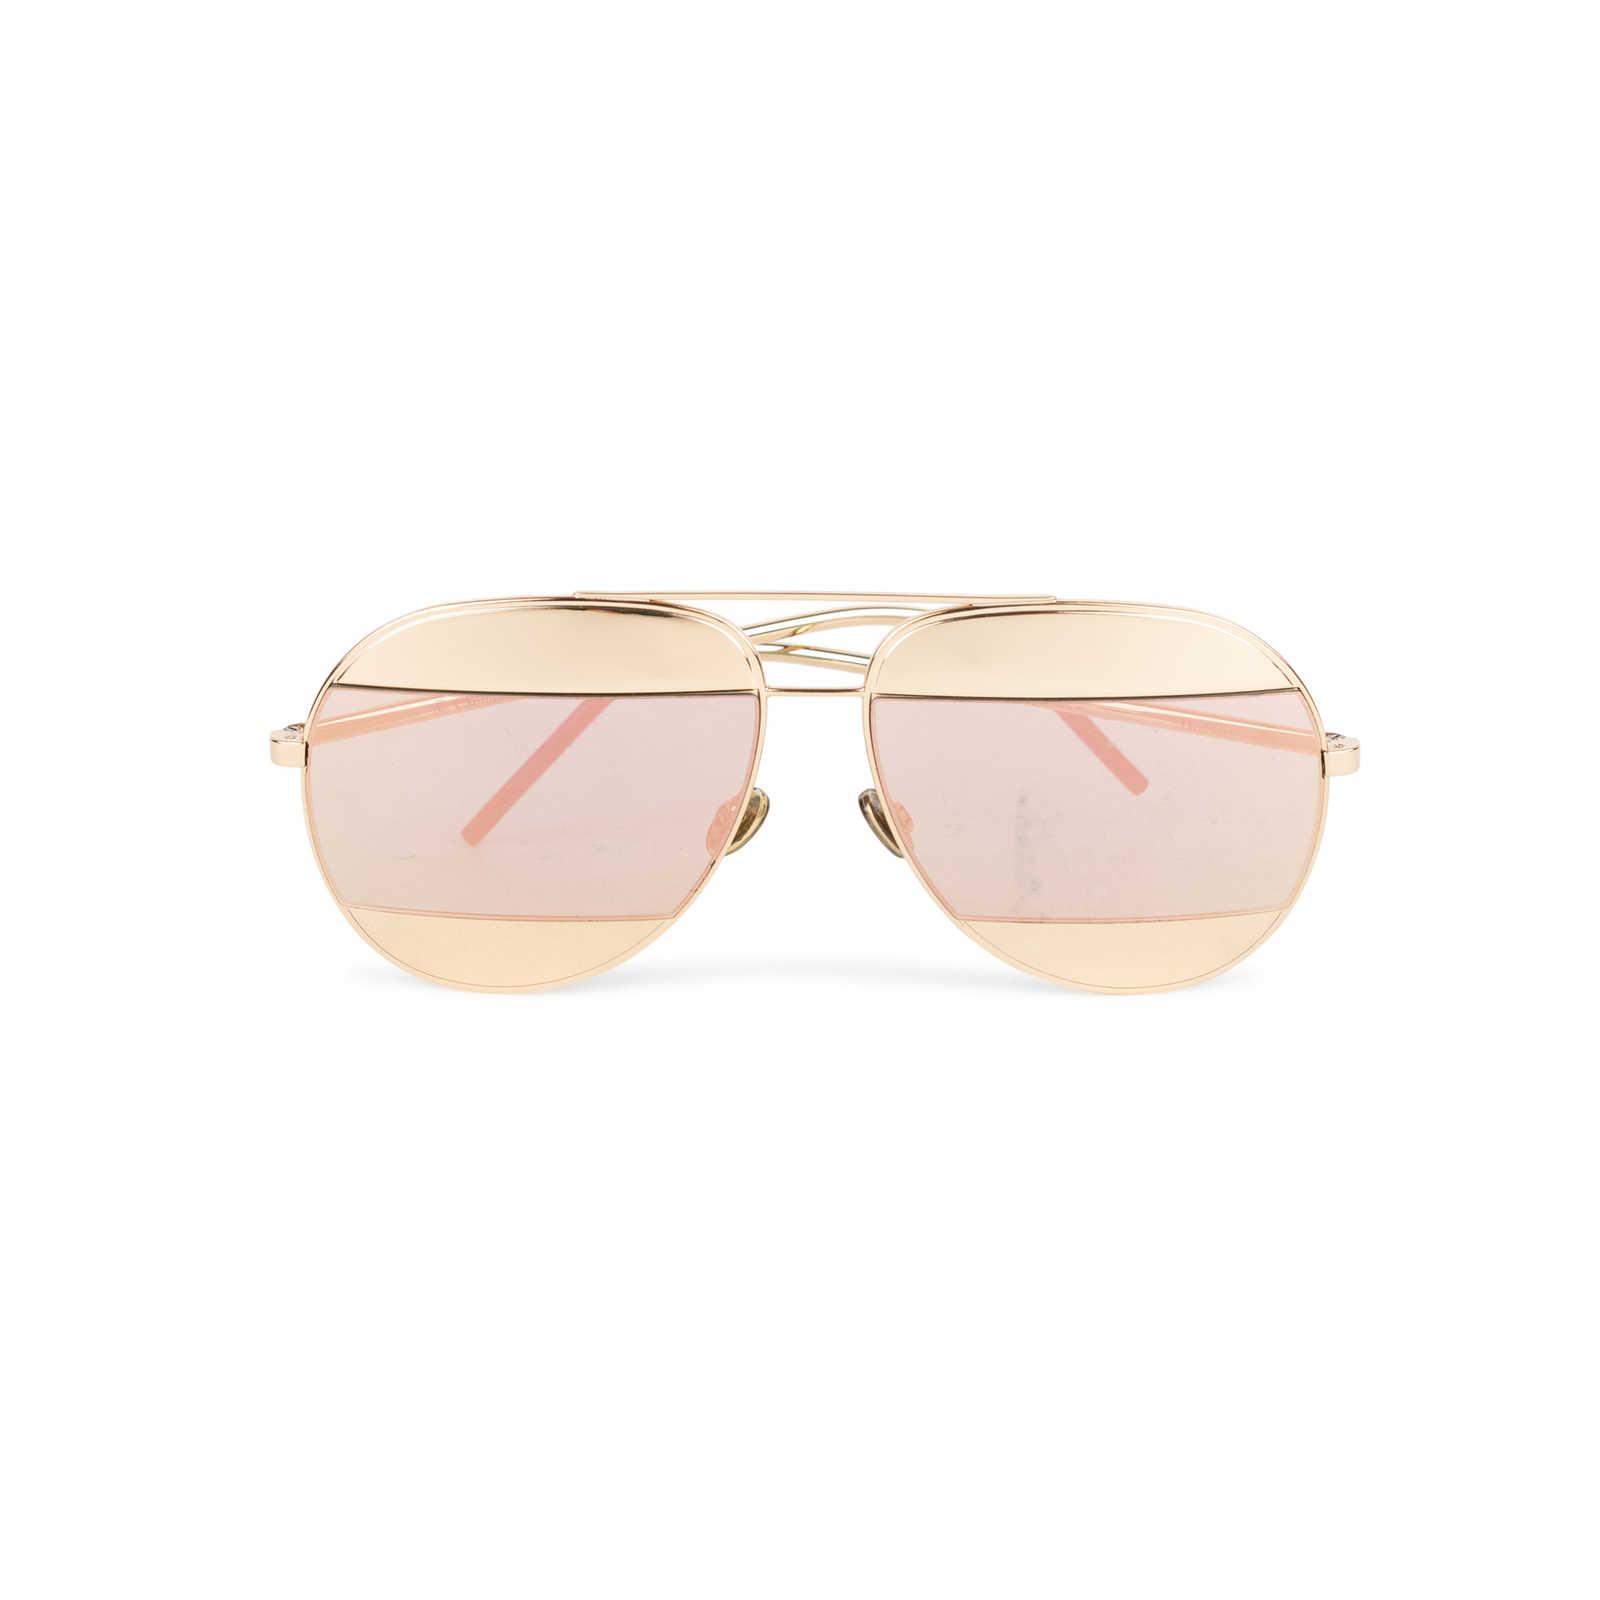 566cbd8b79c Authentic Second Hand Christian Dior Dior Split 1 Sunglasses  (PSS-552-00017) ...